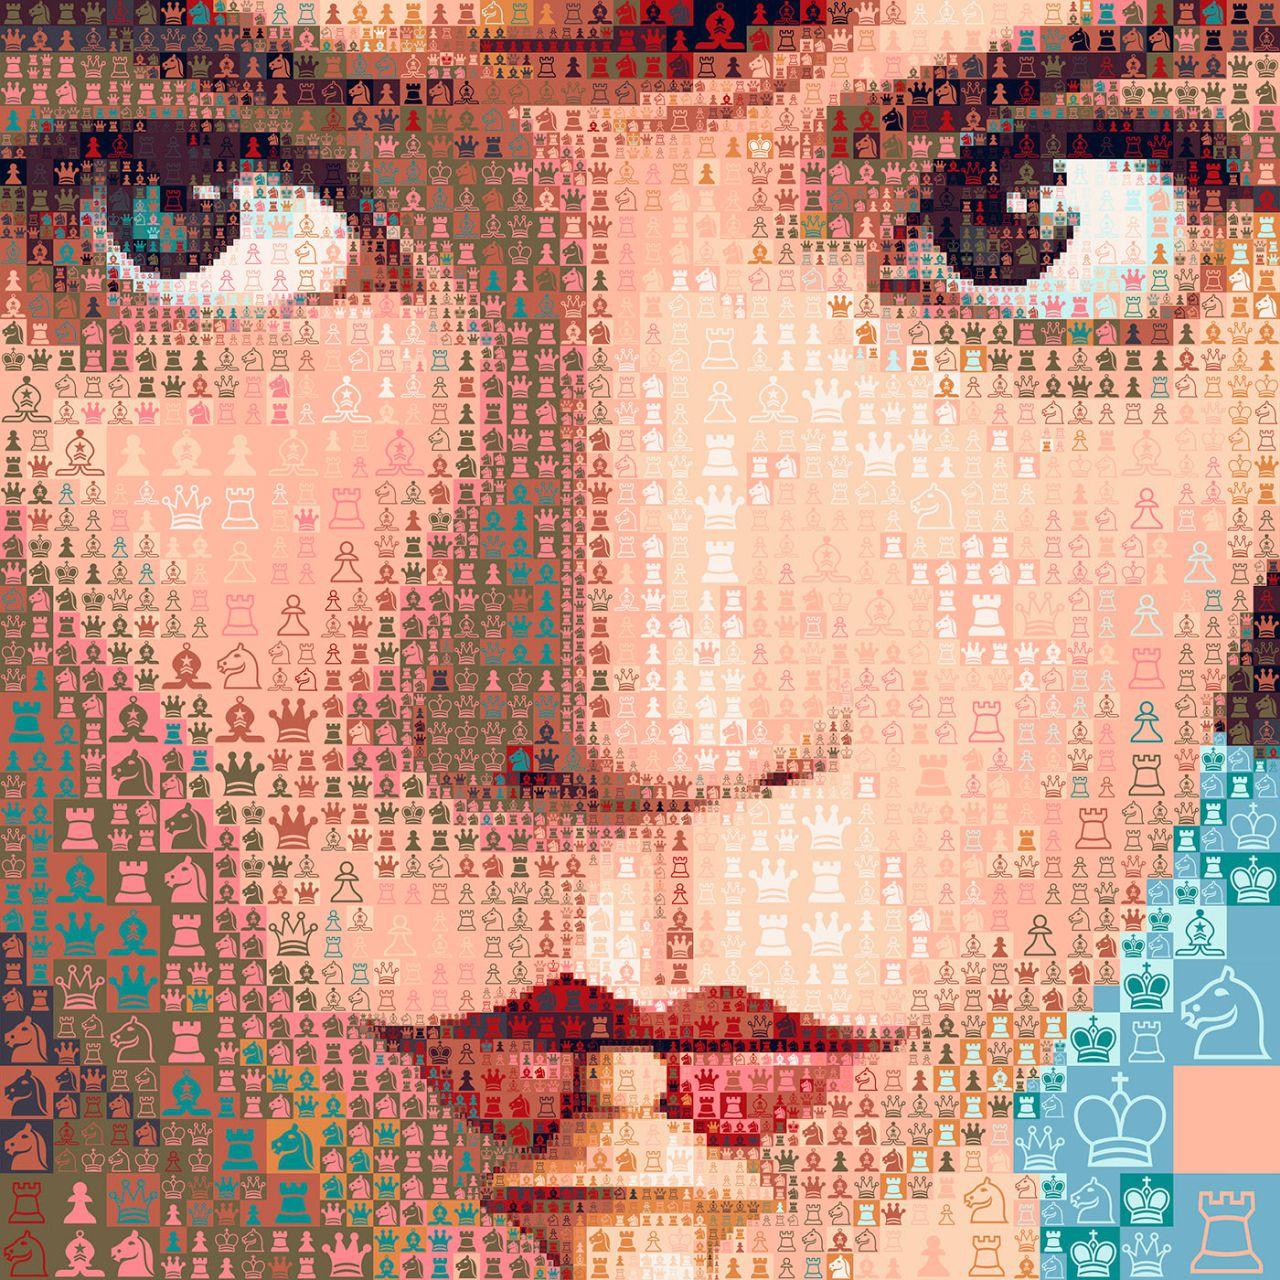 photo mosaic manipulation queen gambit